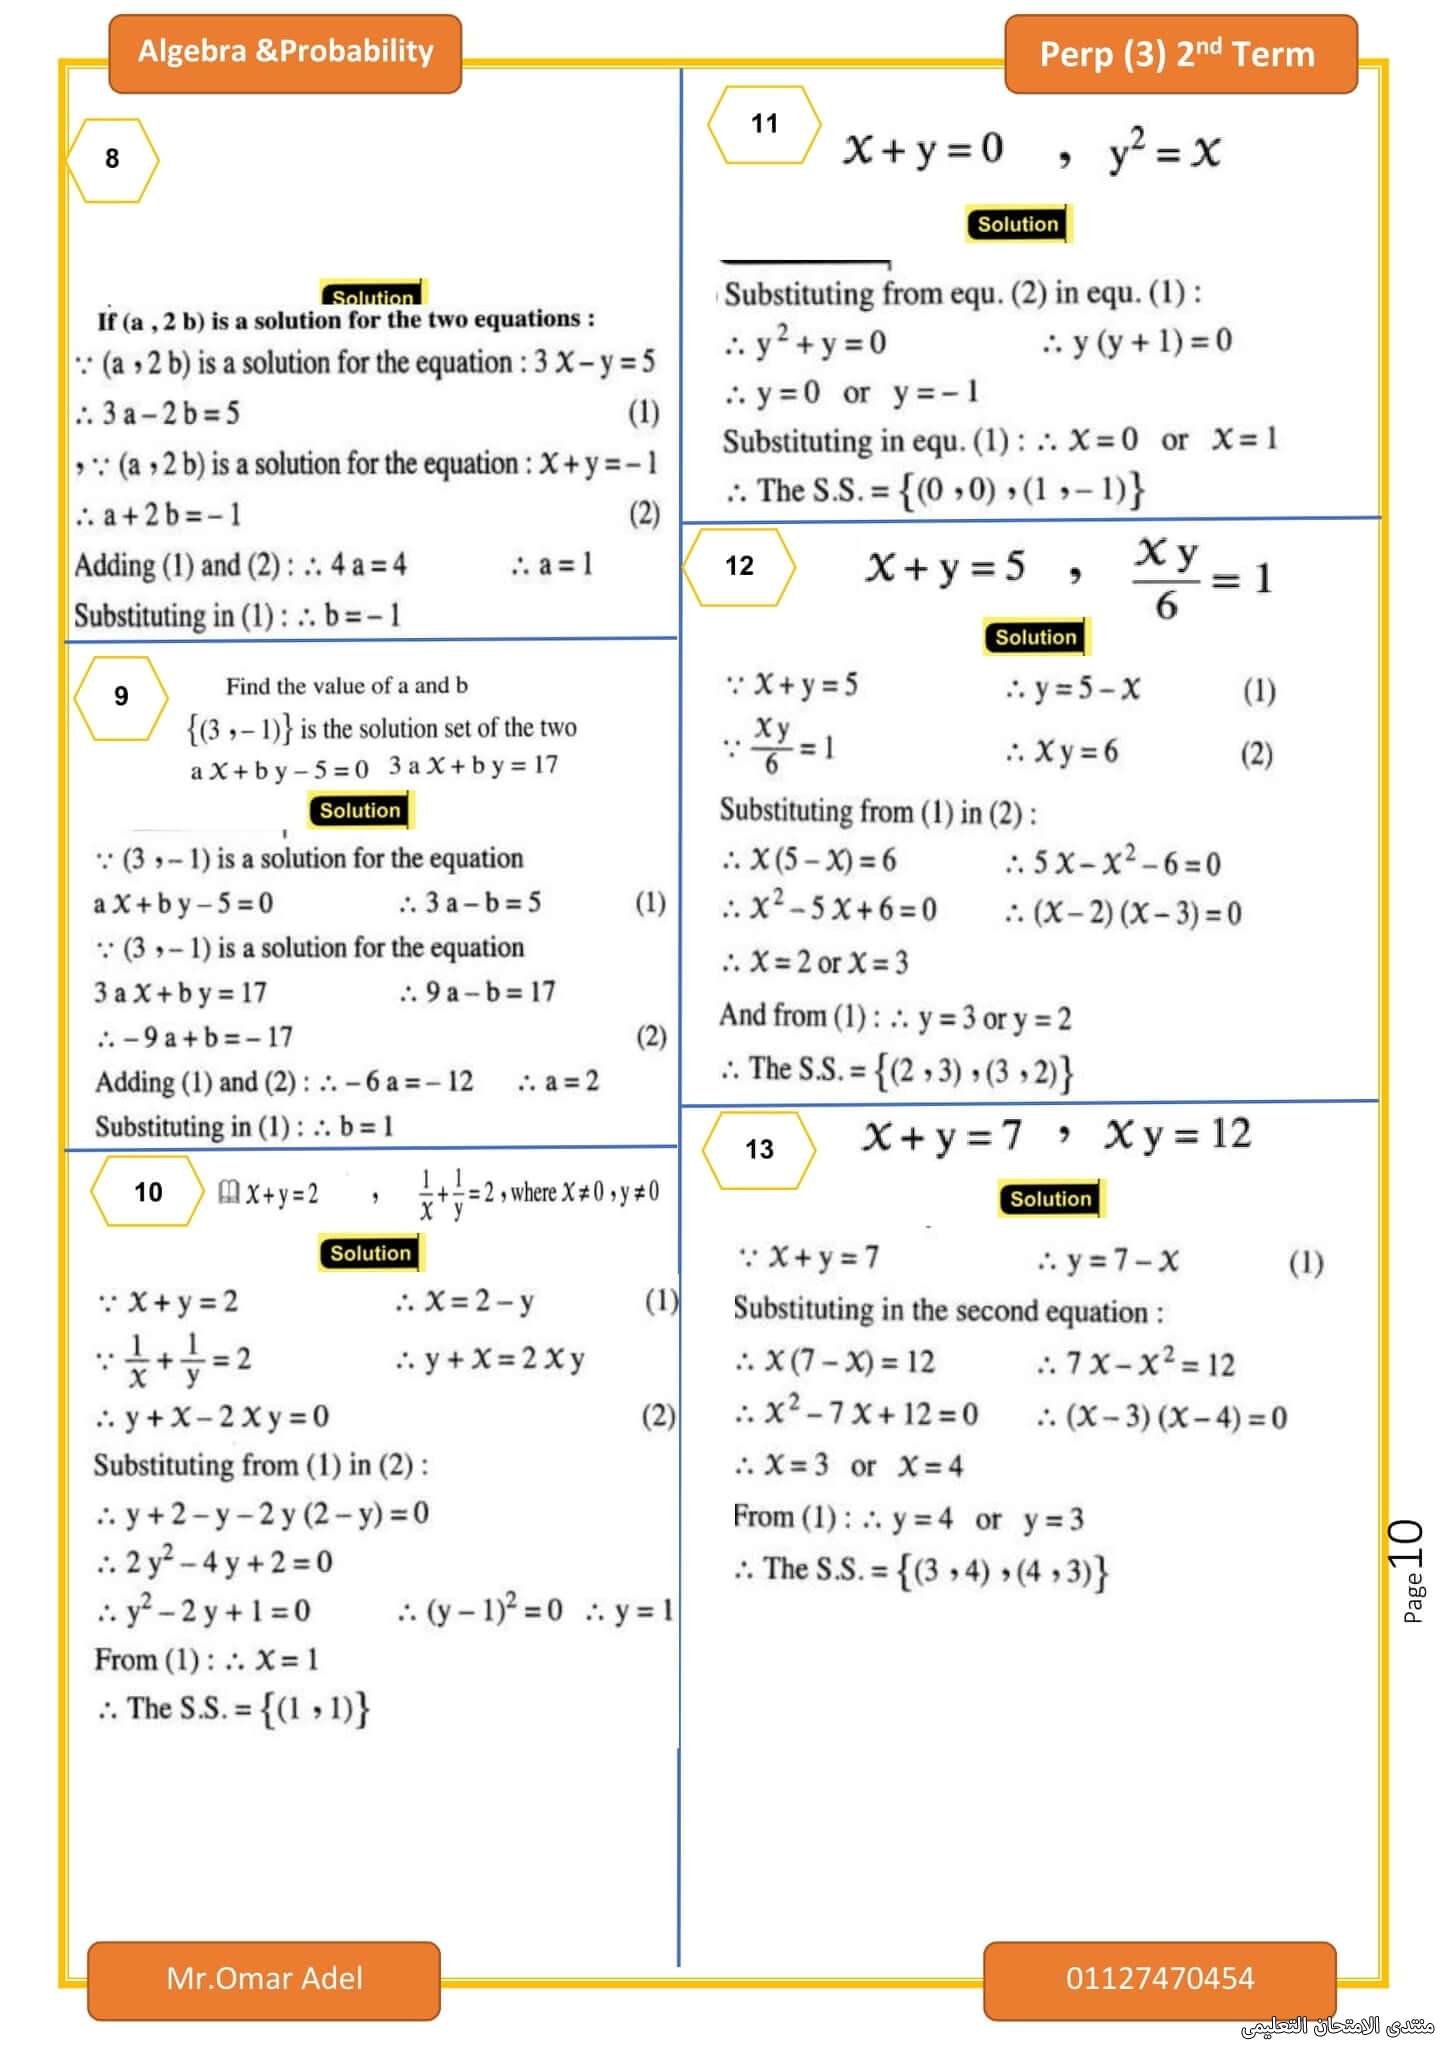 exam-eg.com_1621150392758210.jpg